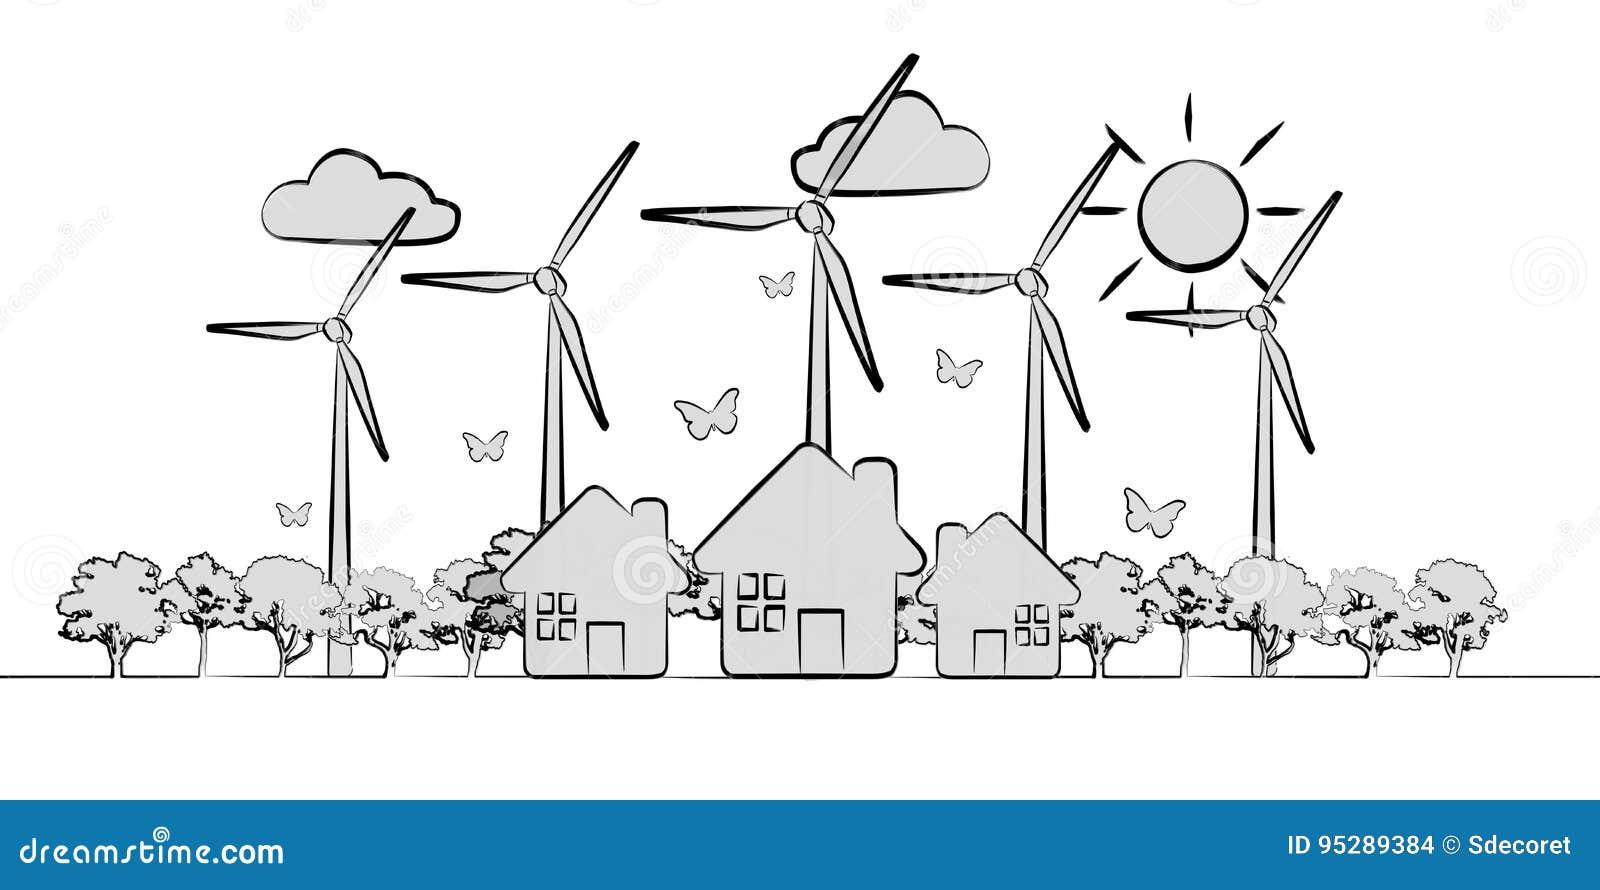 Hand-drawn renewable energy sketch